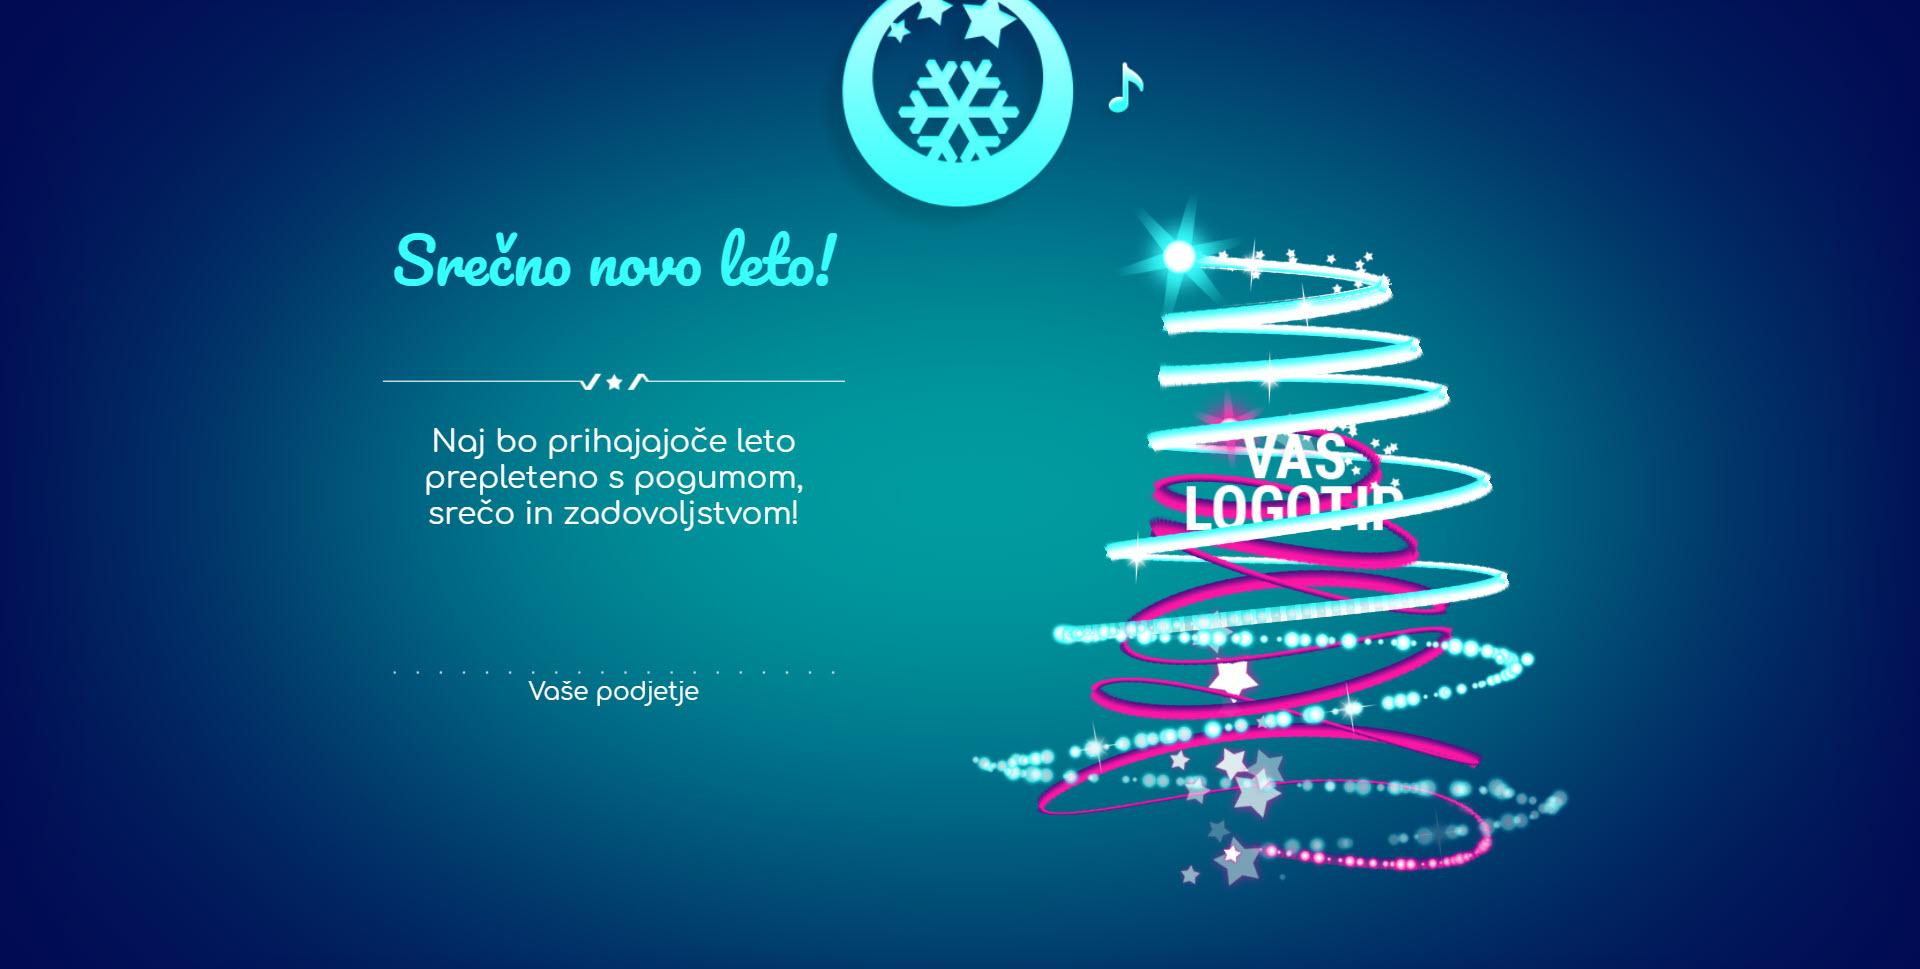 christmas card tree of lights version blue - Naročilo voščilnice